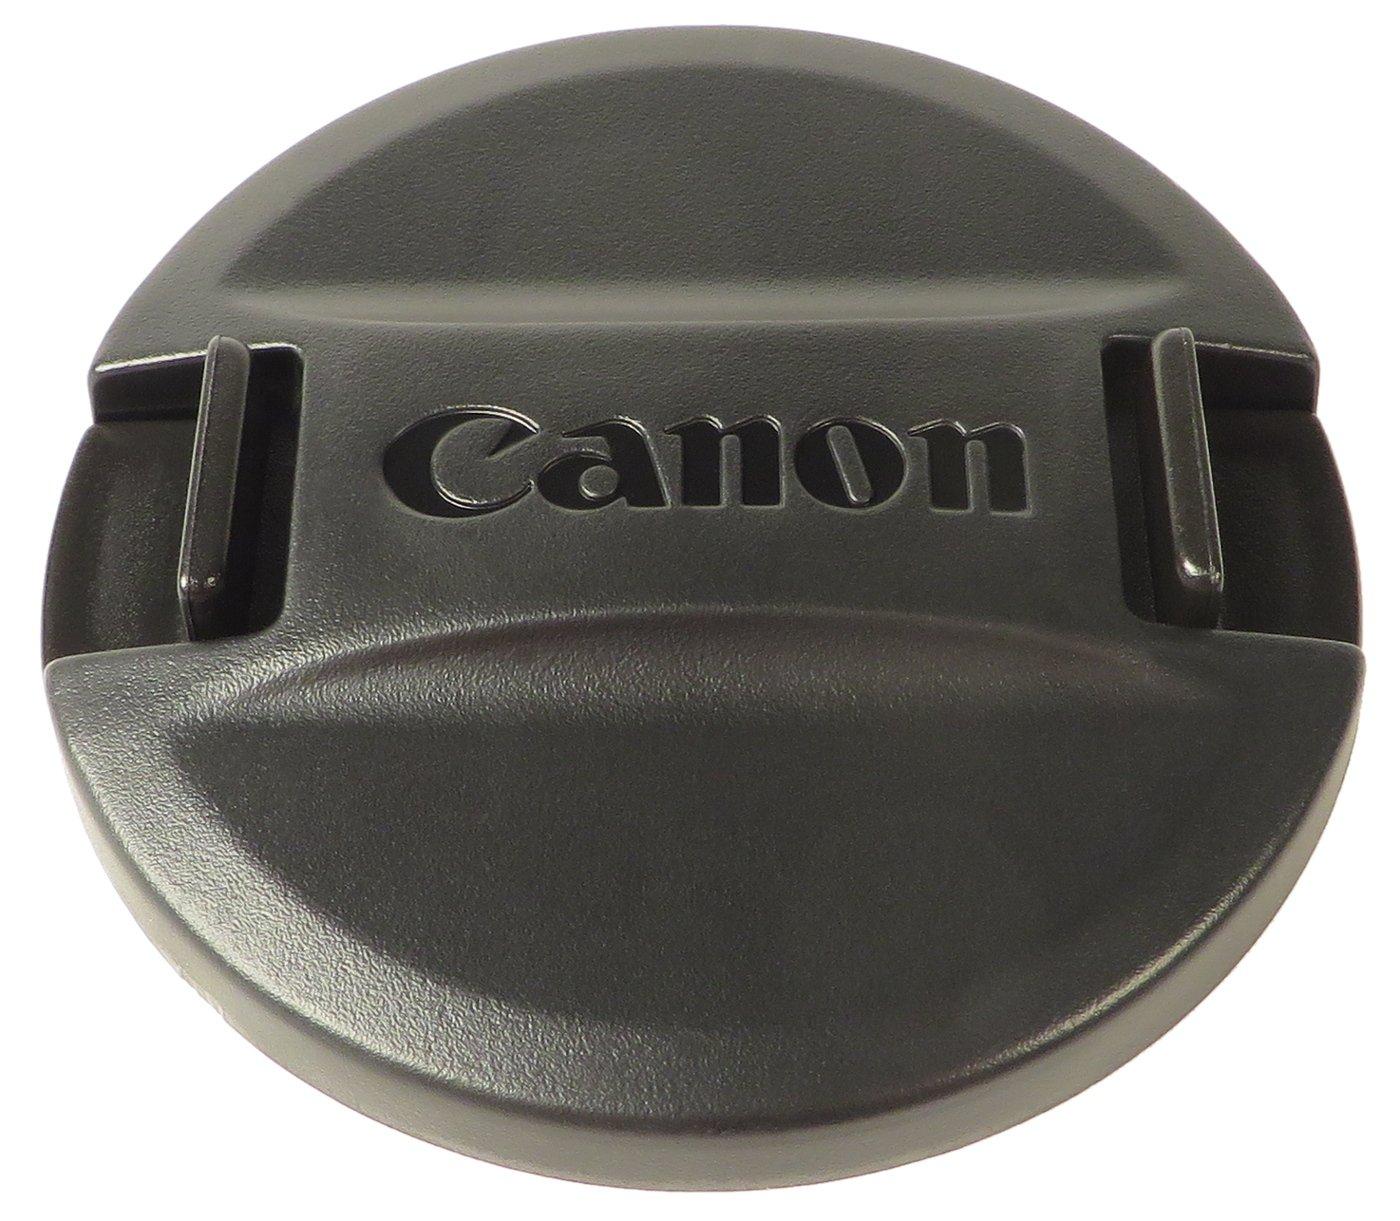 Lens Cap for HFG10, XF100, and XA10